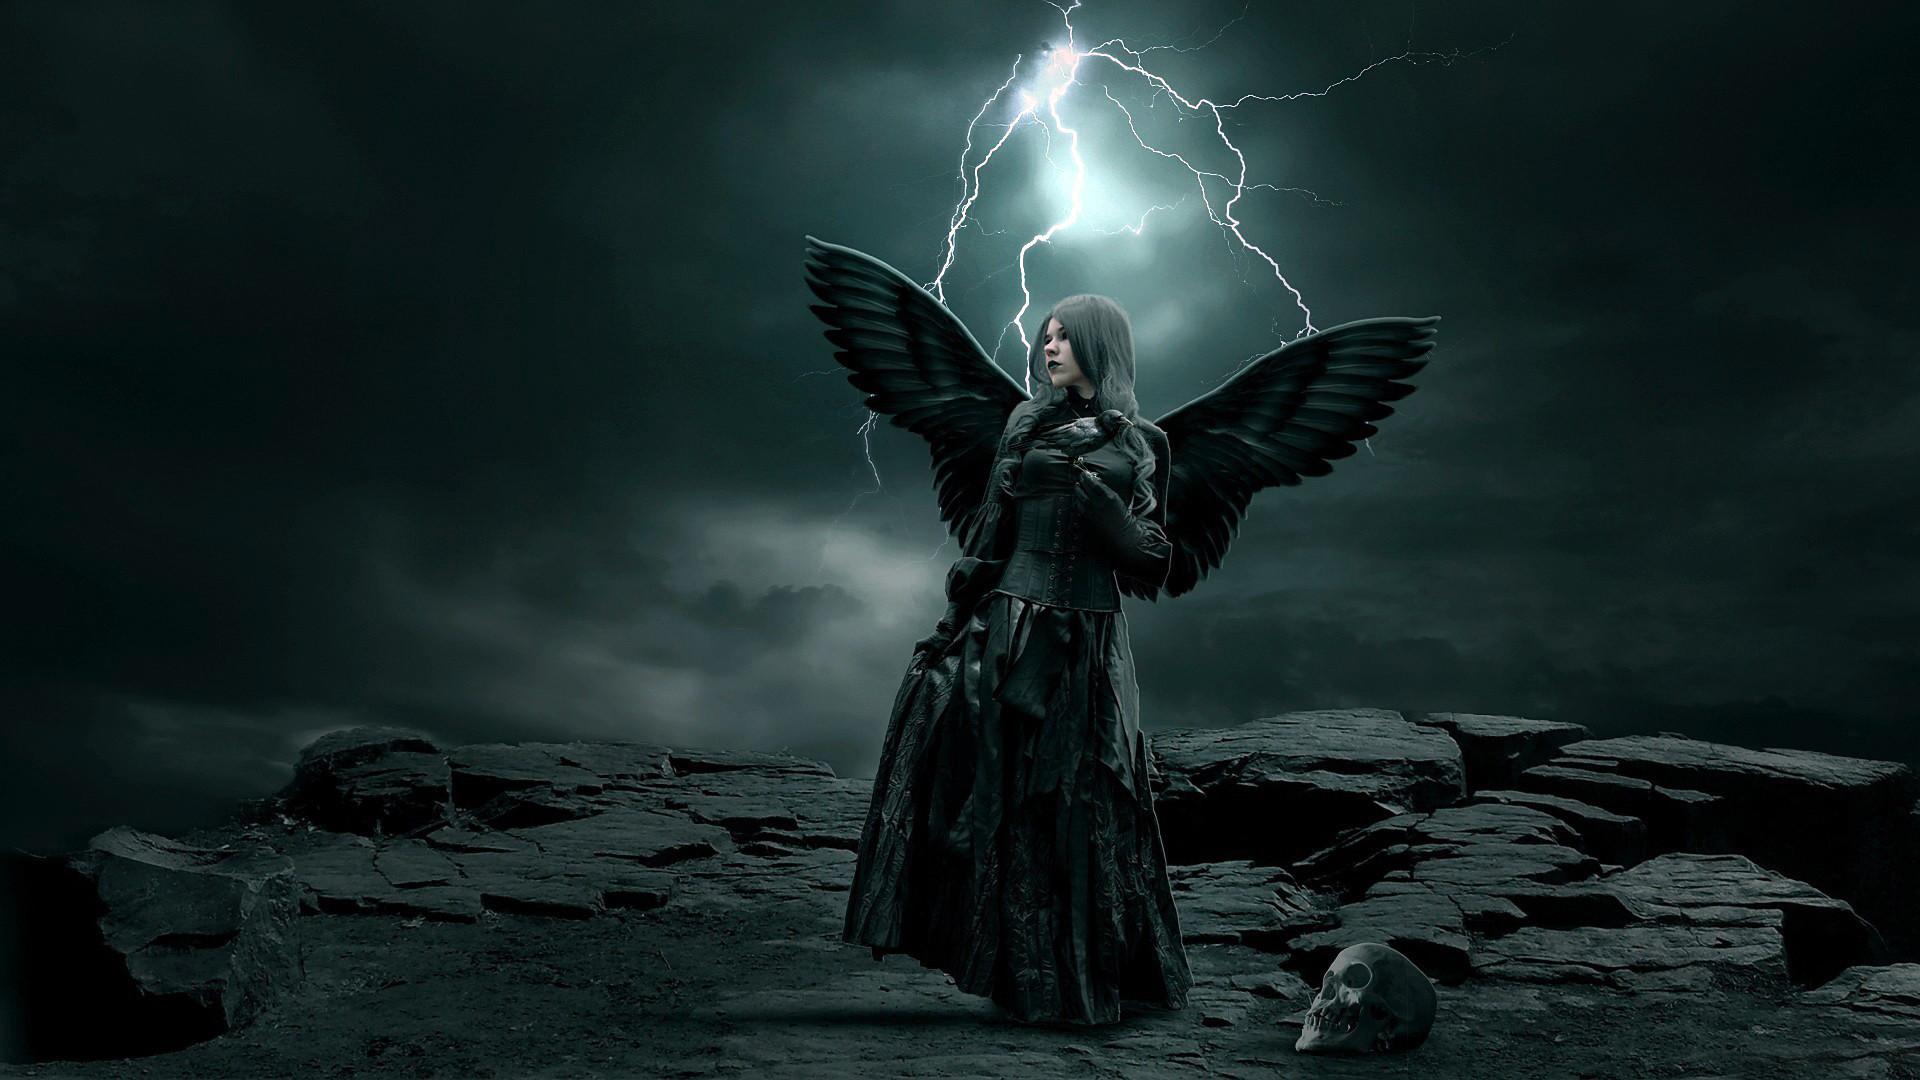 Download Rocks Stones Girl Wings Angel Skull Sky Clouds Lightning Storm  Dark Gothic Wallpaper At Dark Wallpapers